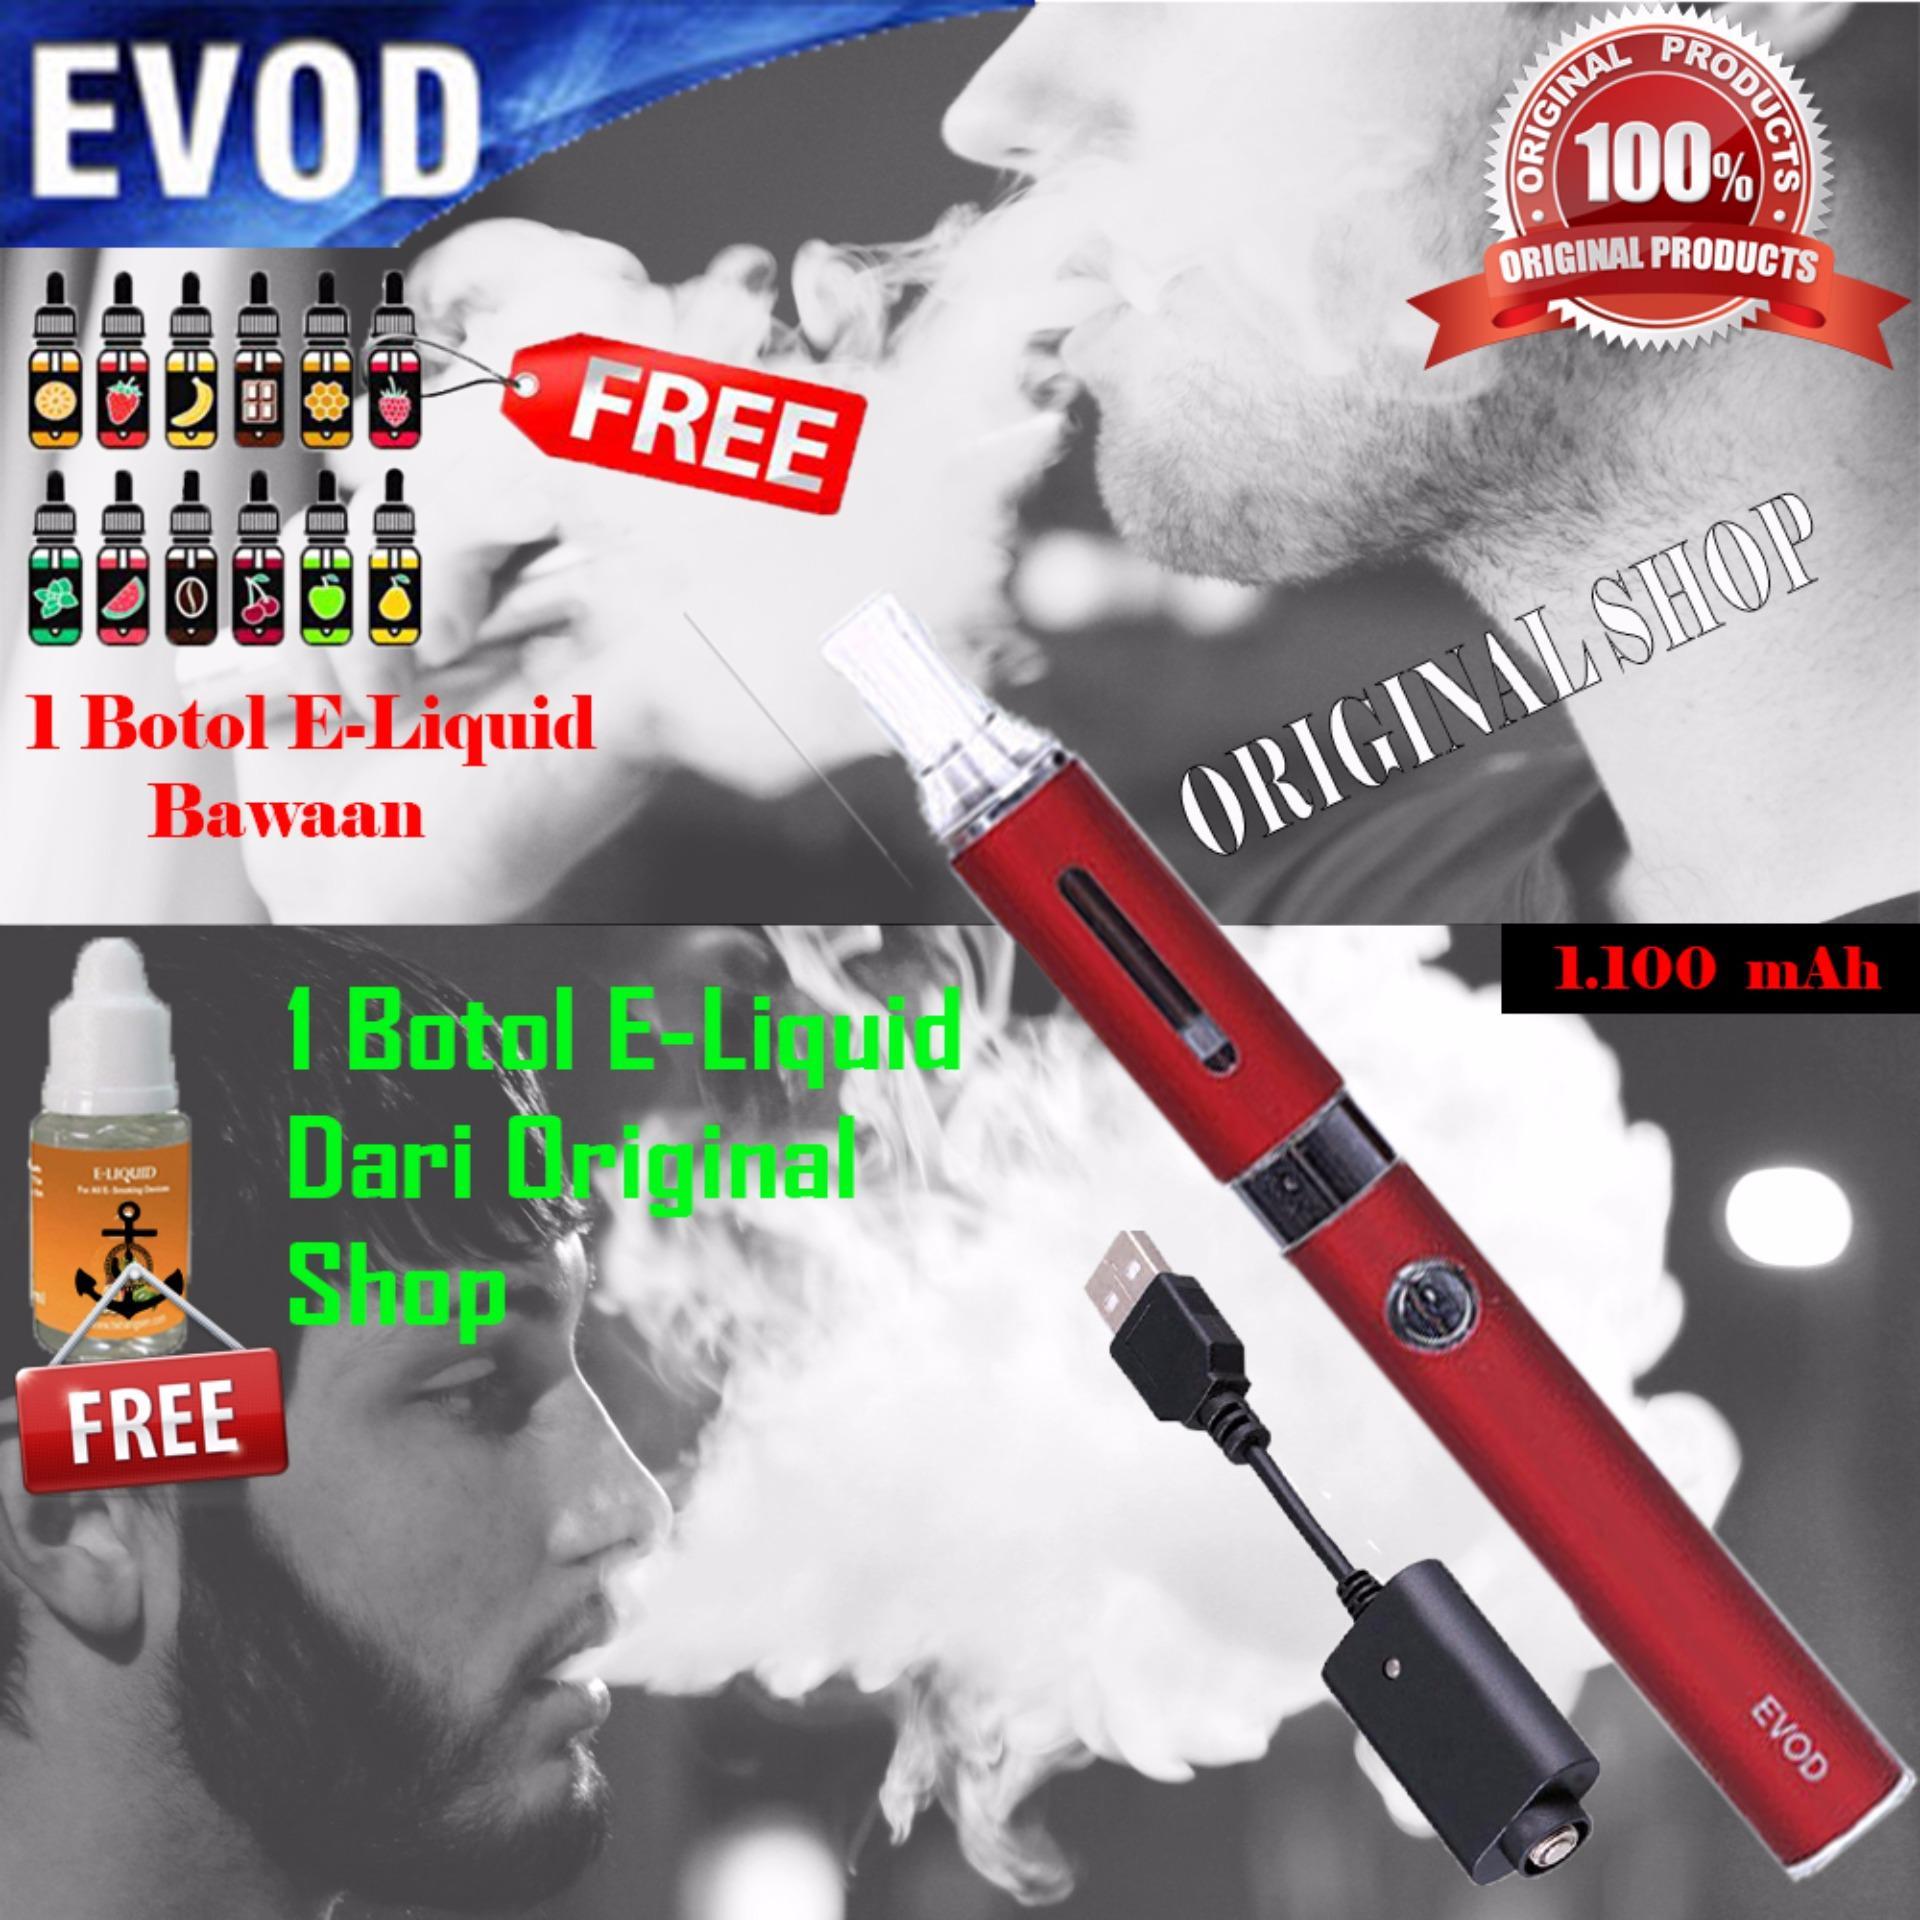 Harga Penawaran Original Evod Rokok Elektrik 1100mah Include Charger Elektric Flash Sale E Liquid Free 1 Botol Merah